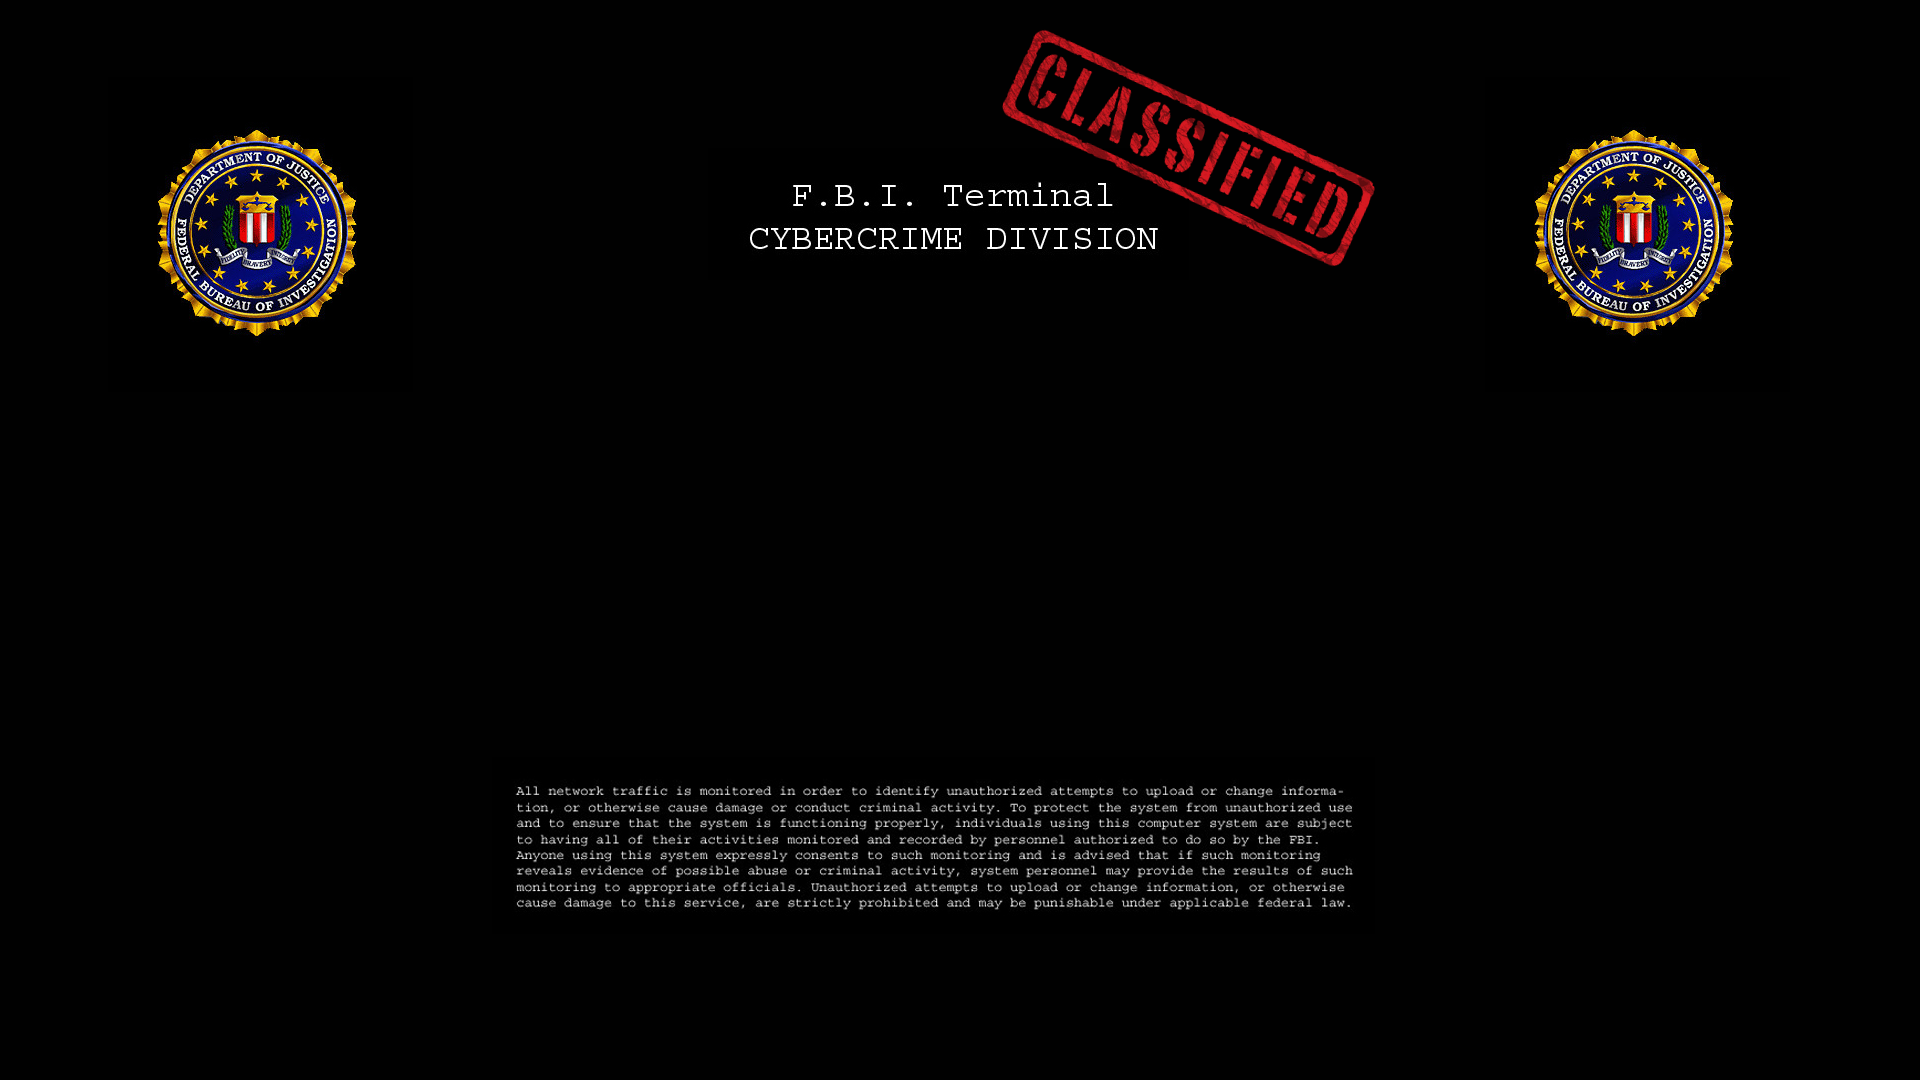 fbi cybercrime logon 1080p by w1ck3dmatt on deviantart